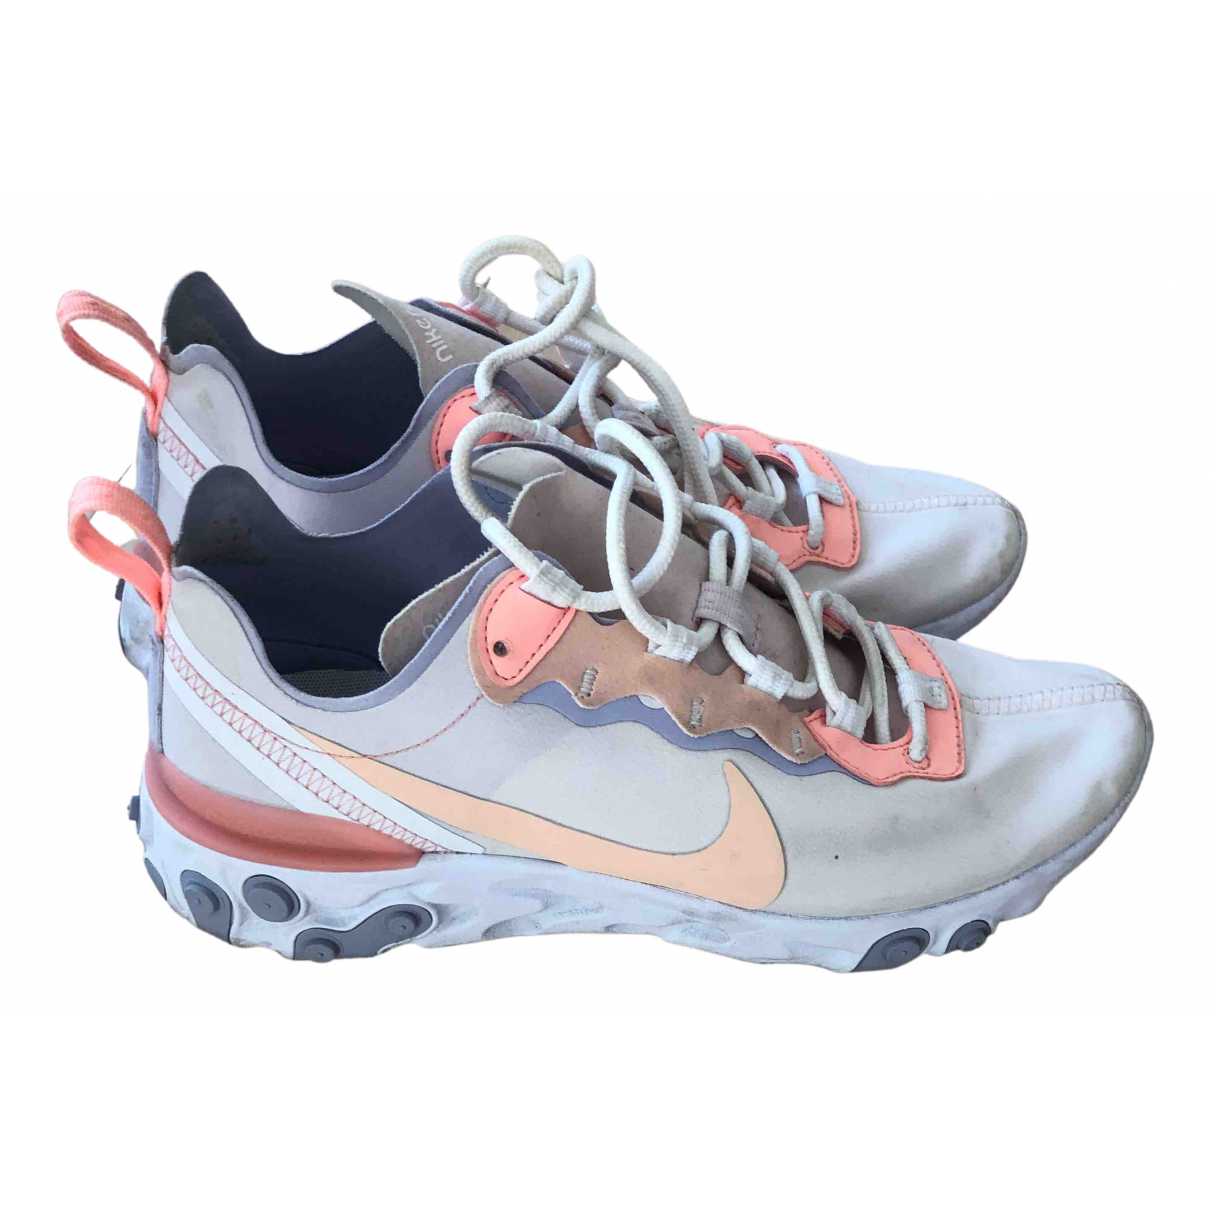 Nike React element 55 White Cloth Trainers for Women 39 EU